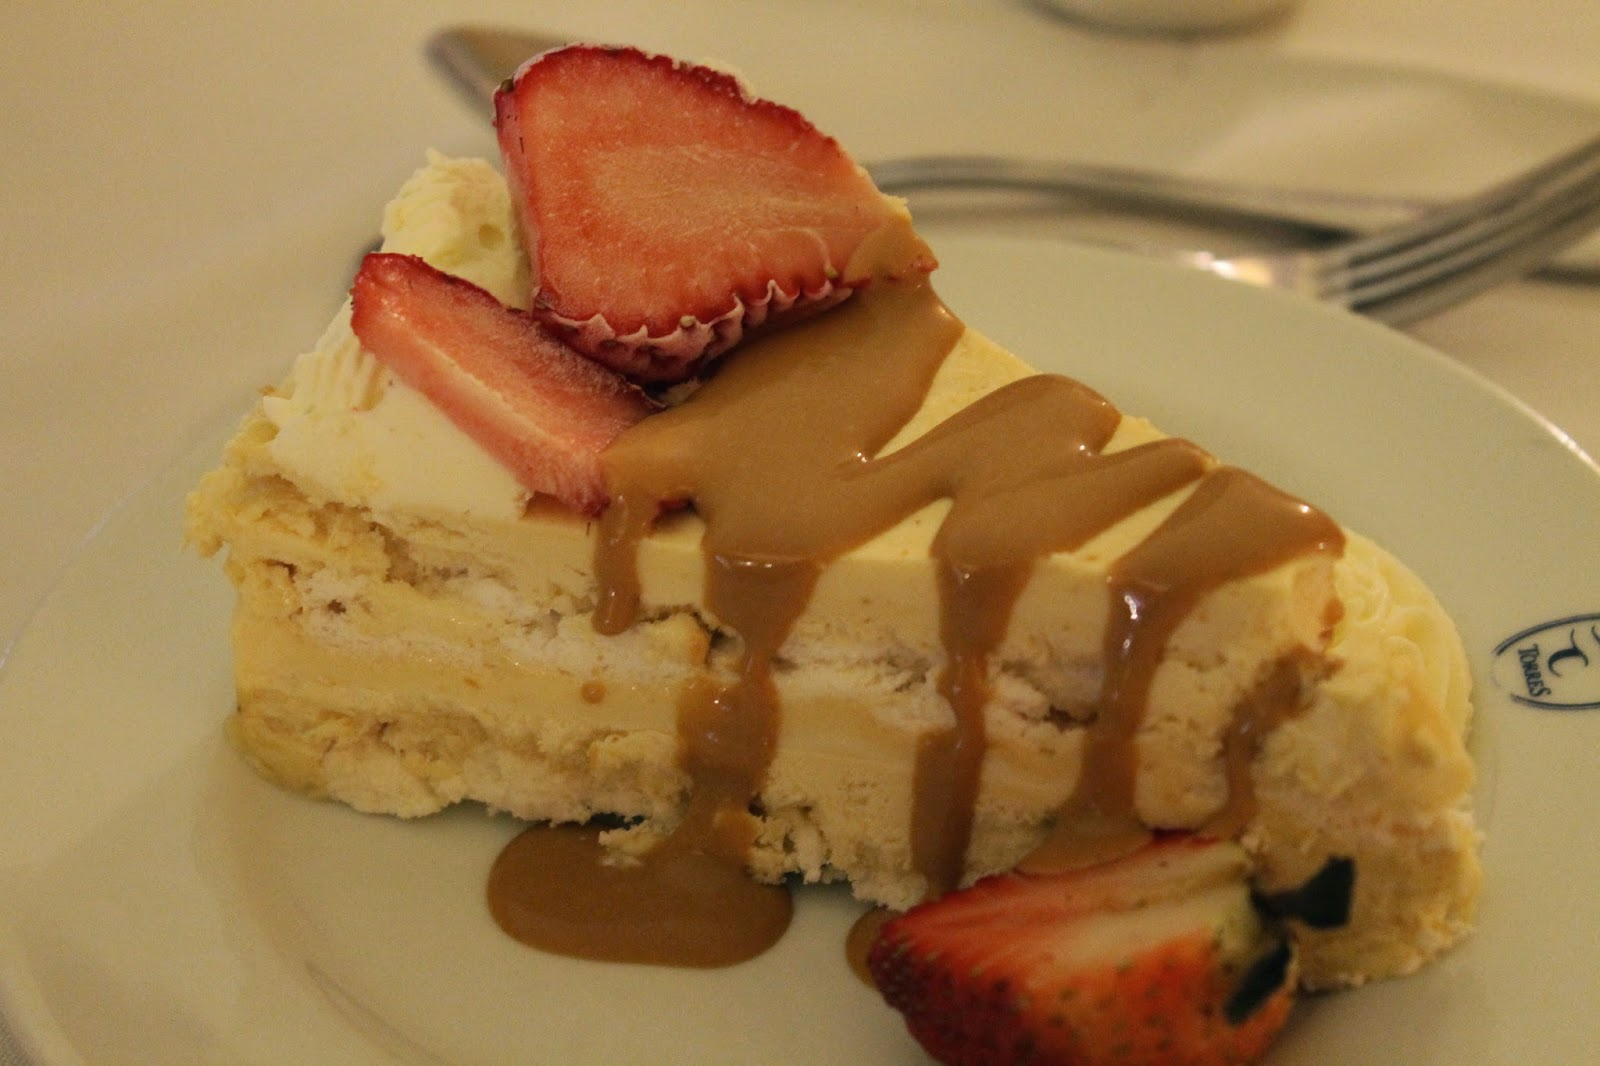 Chile dessert